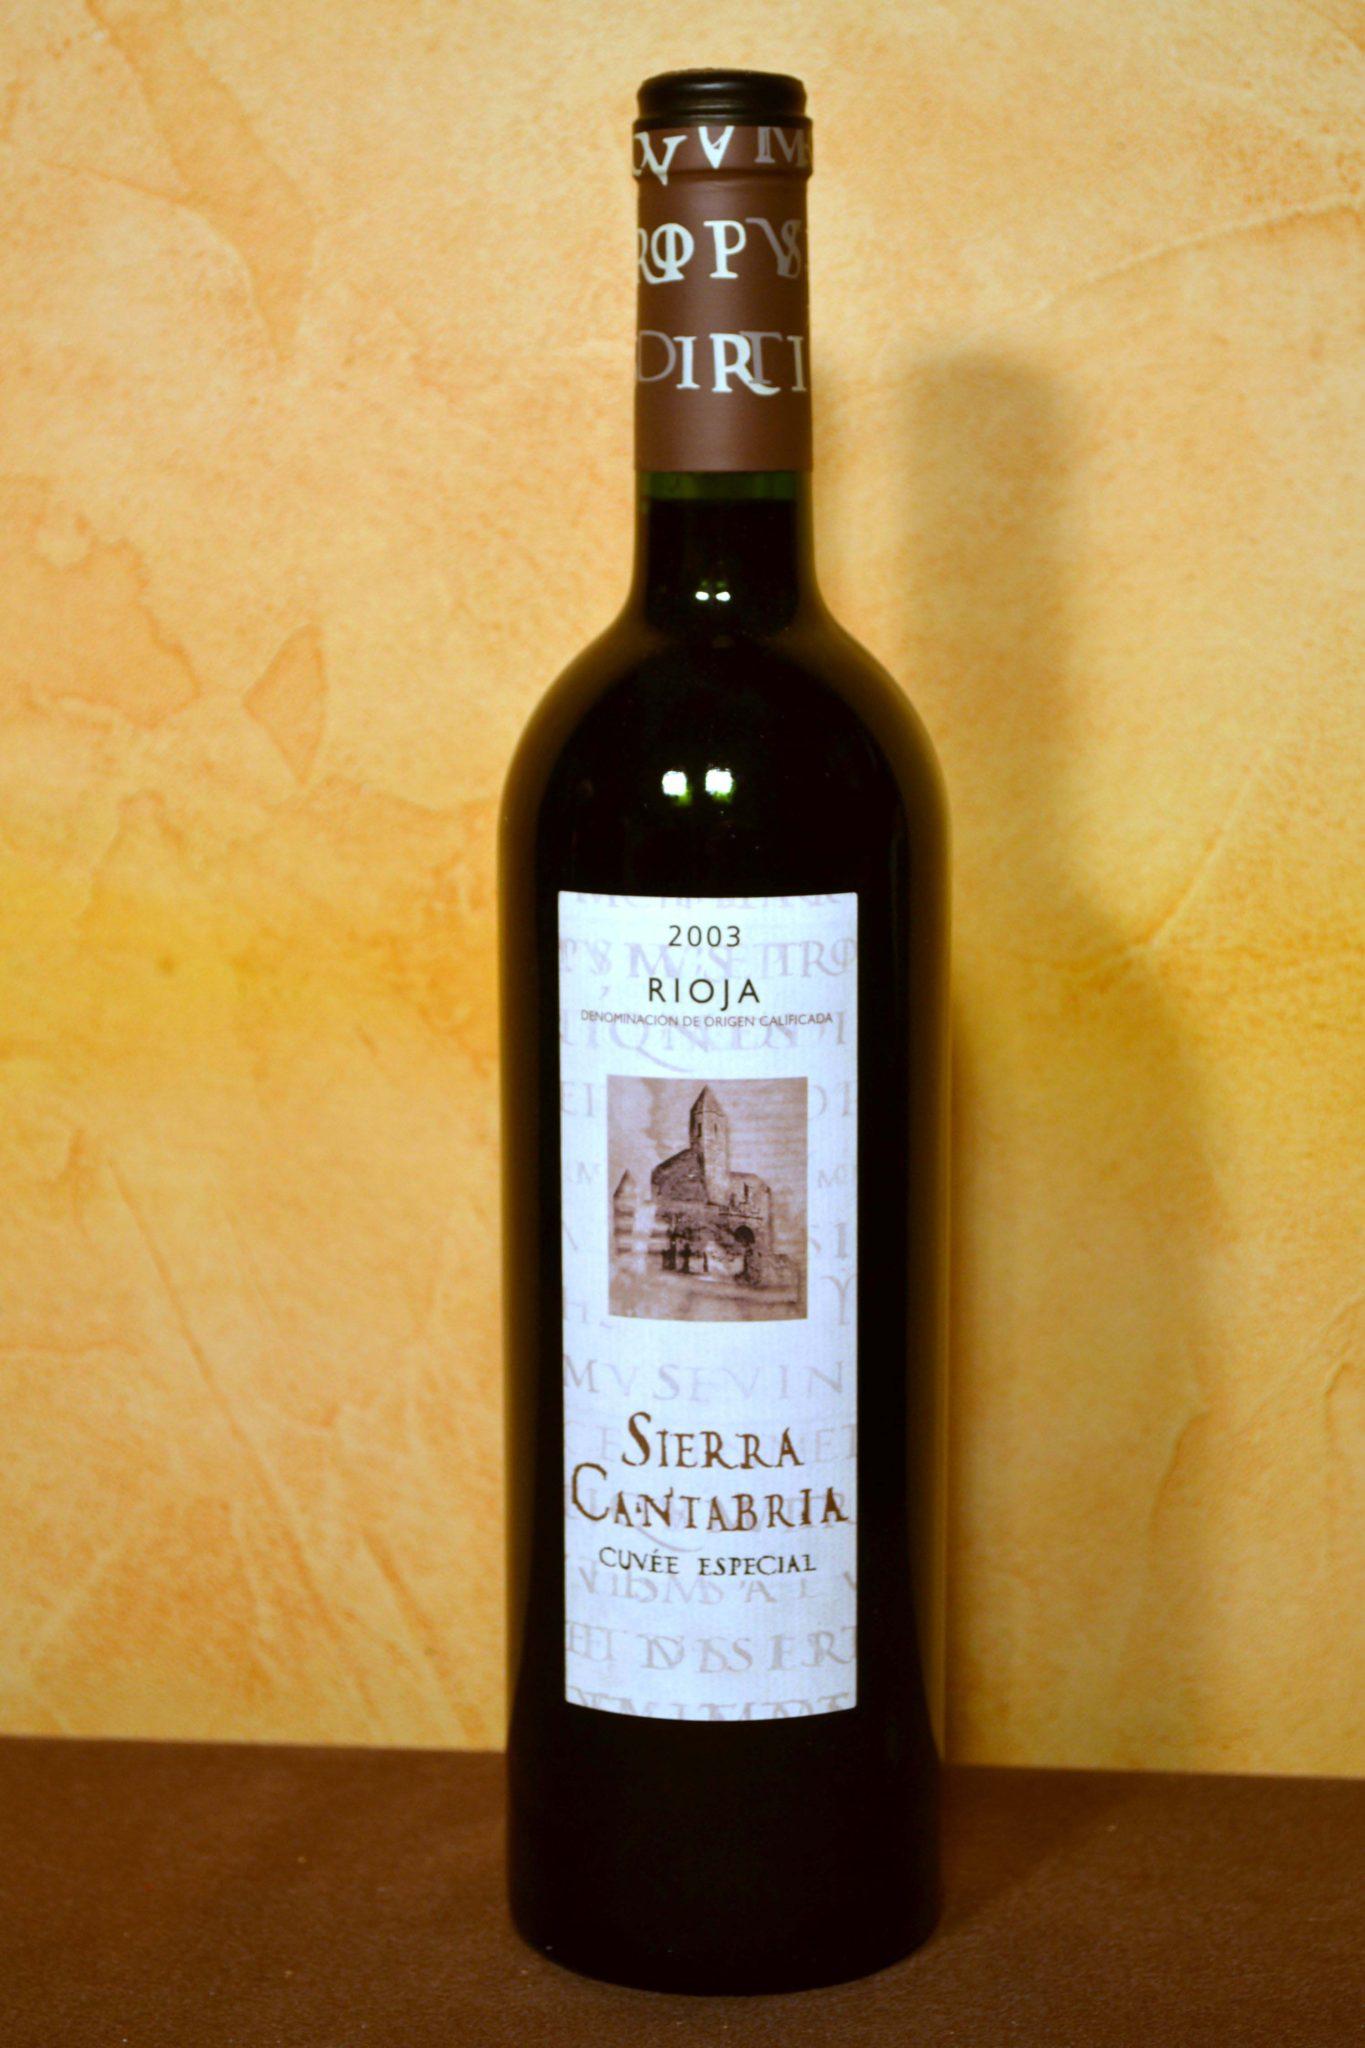 Sierra Cantabria Cuvee Special 2003